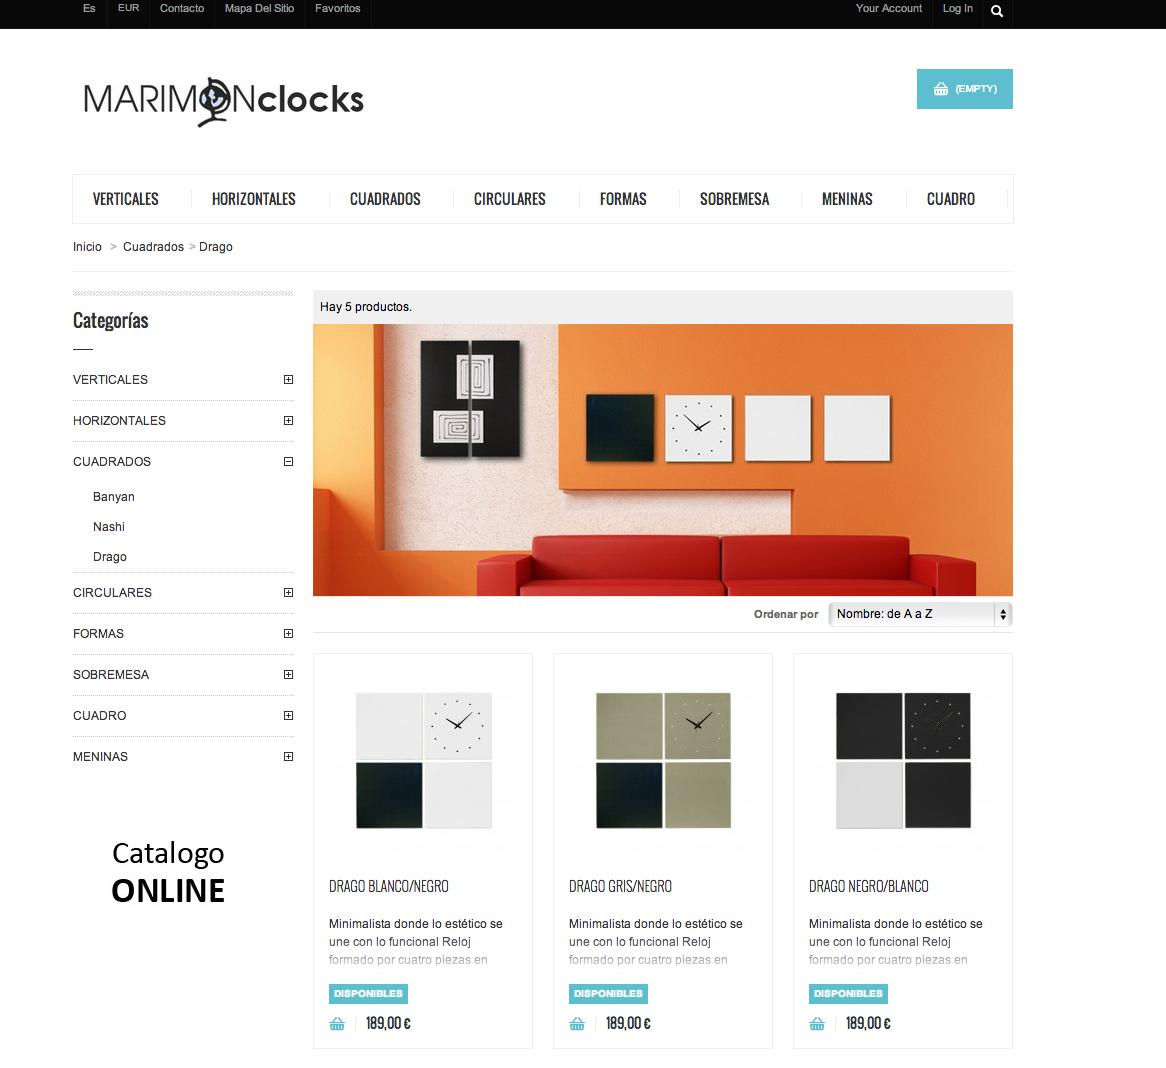 Relojes de Pared: Tienda Online Relojes Marimon